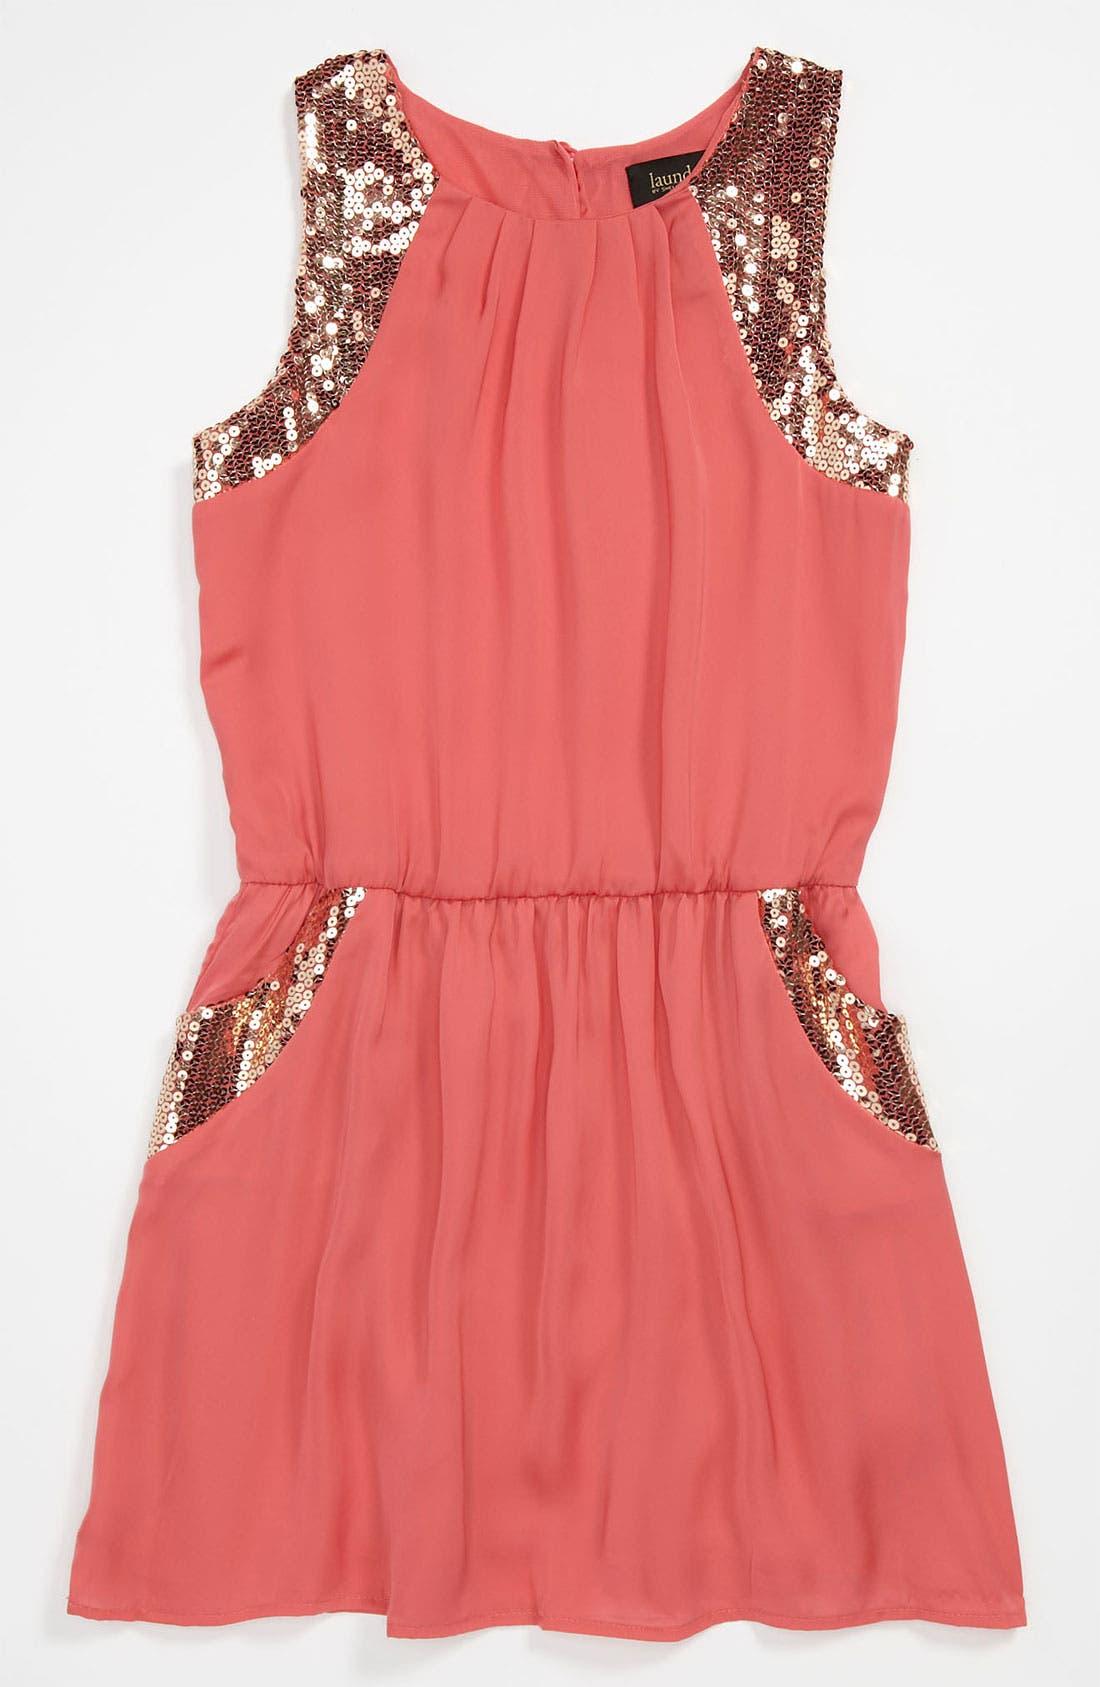 Alternate Image 1 Selected - Laundry by Shelli Segal 'Bella' Sleeveless Dress (Big Girls)